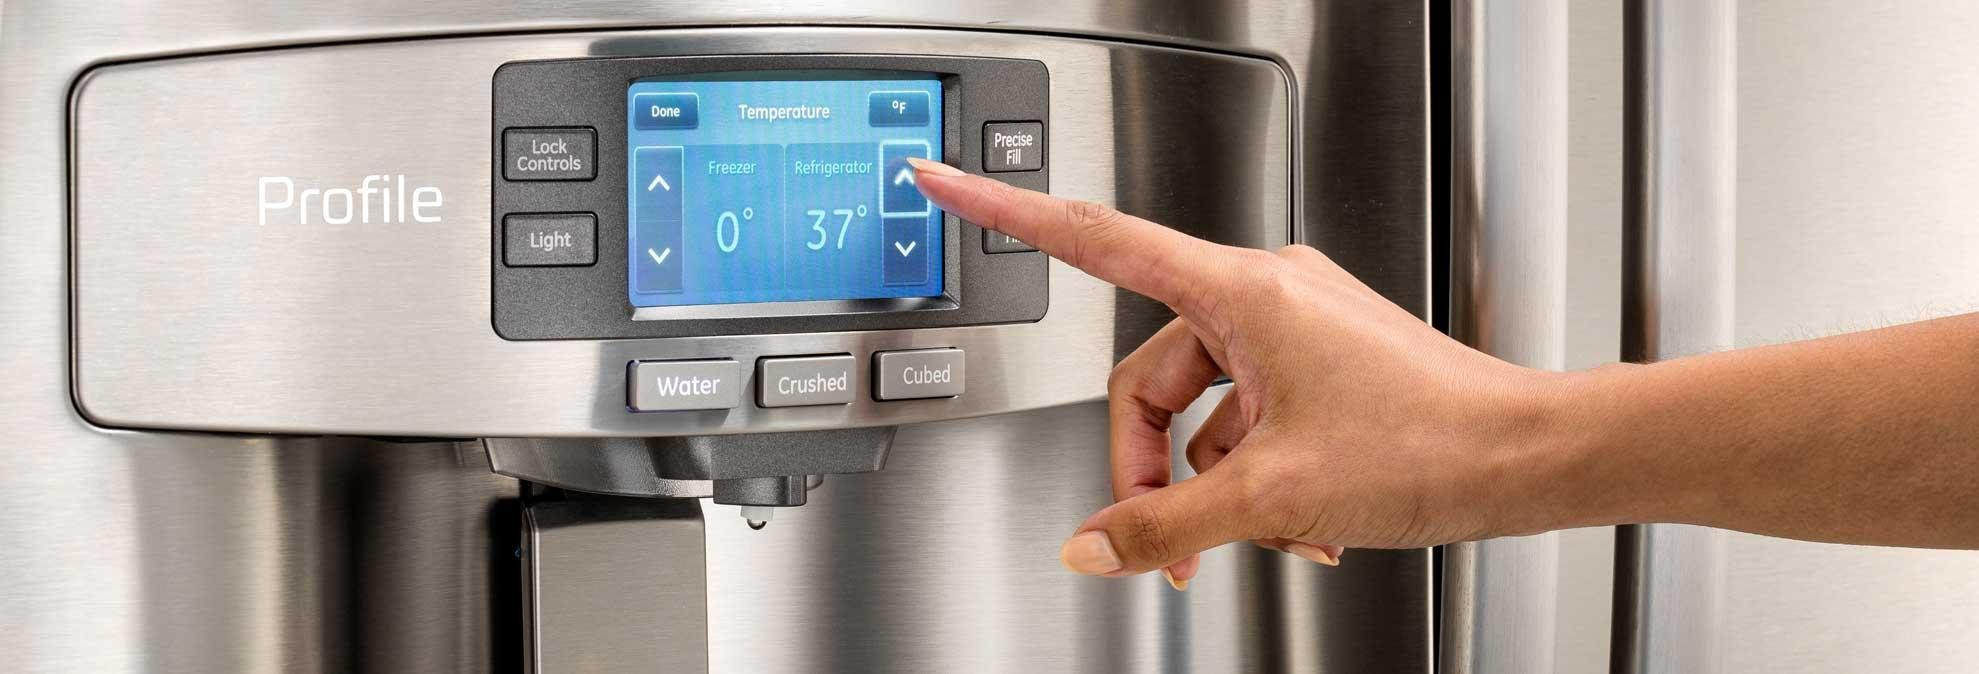 Best refrigerator temperature to keep food fresh - Choosing right freezer ...